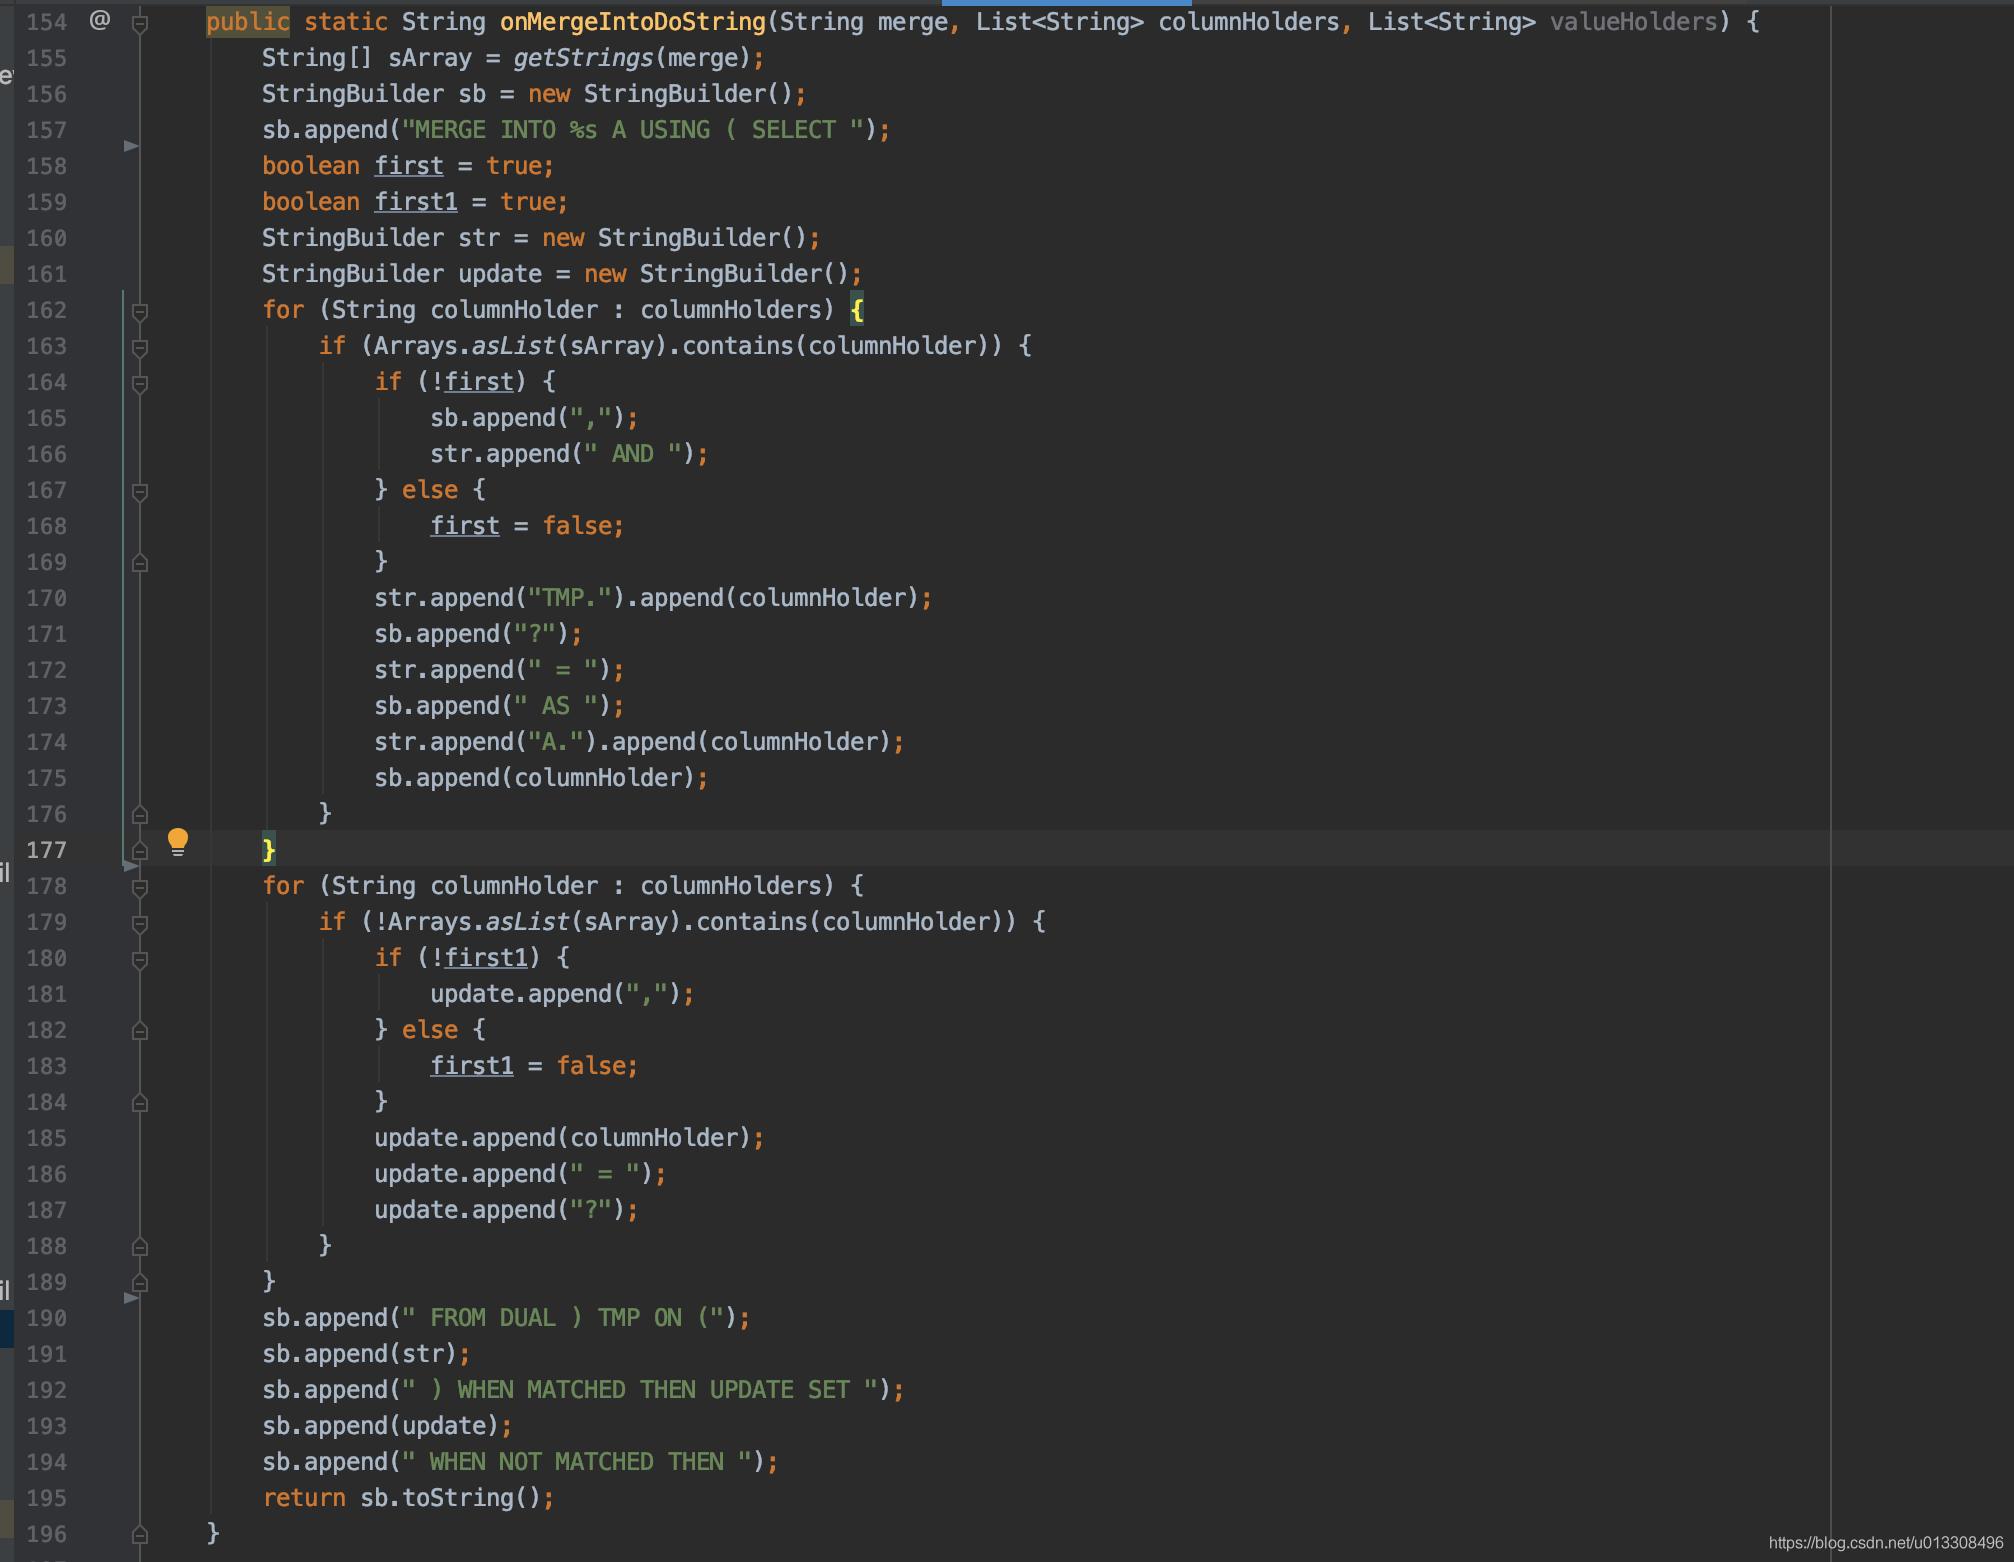 Datax 支持增量 oracle writeMode updateCecotw-